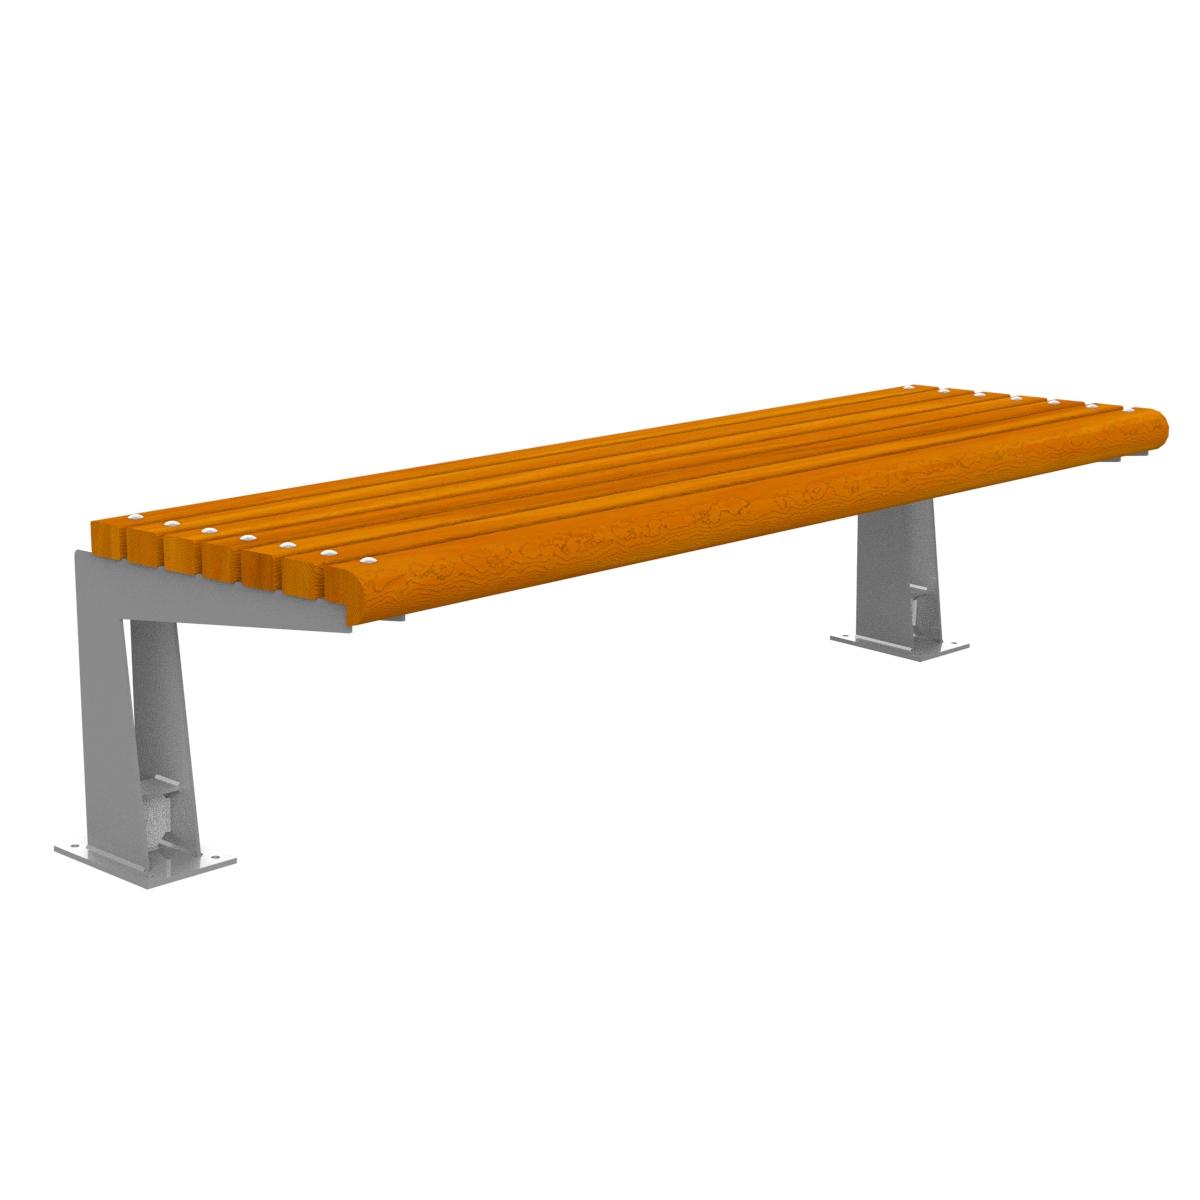 Banco madera ronda sin respaldo mobiliario urbano parques - Banco madera jardin ...